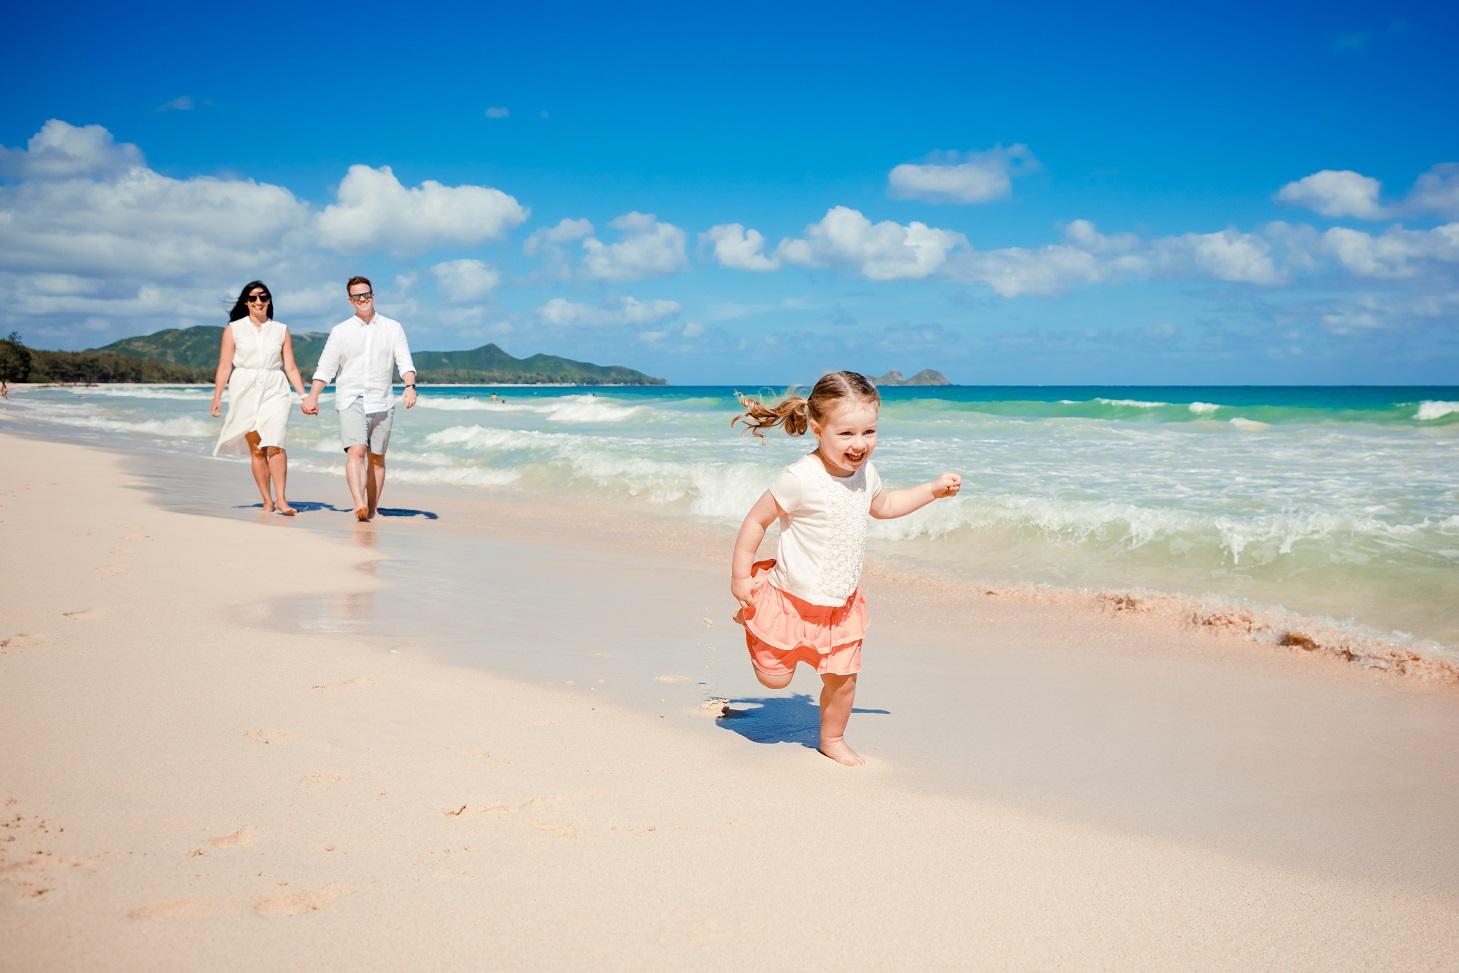 family kids running down hawaii beach sand waves